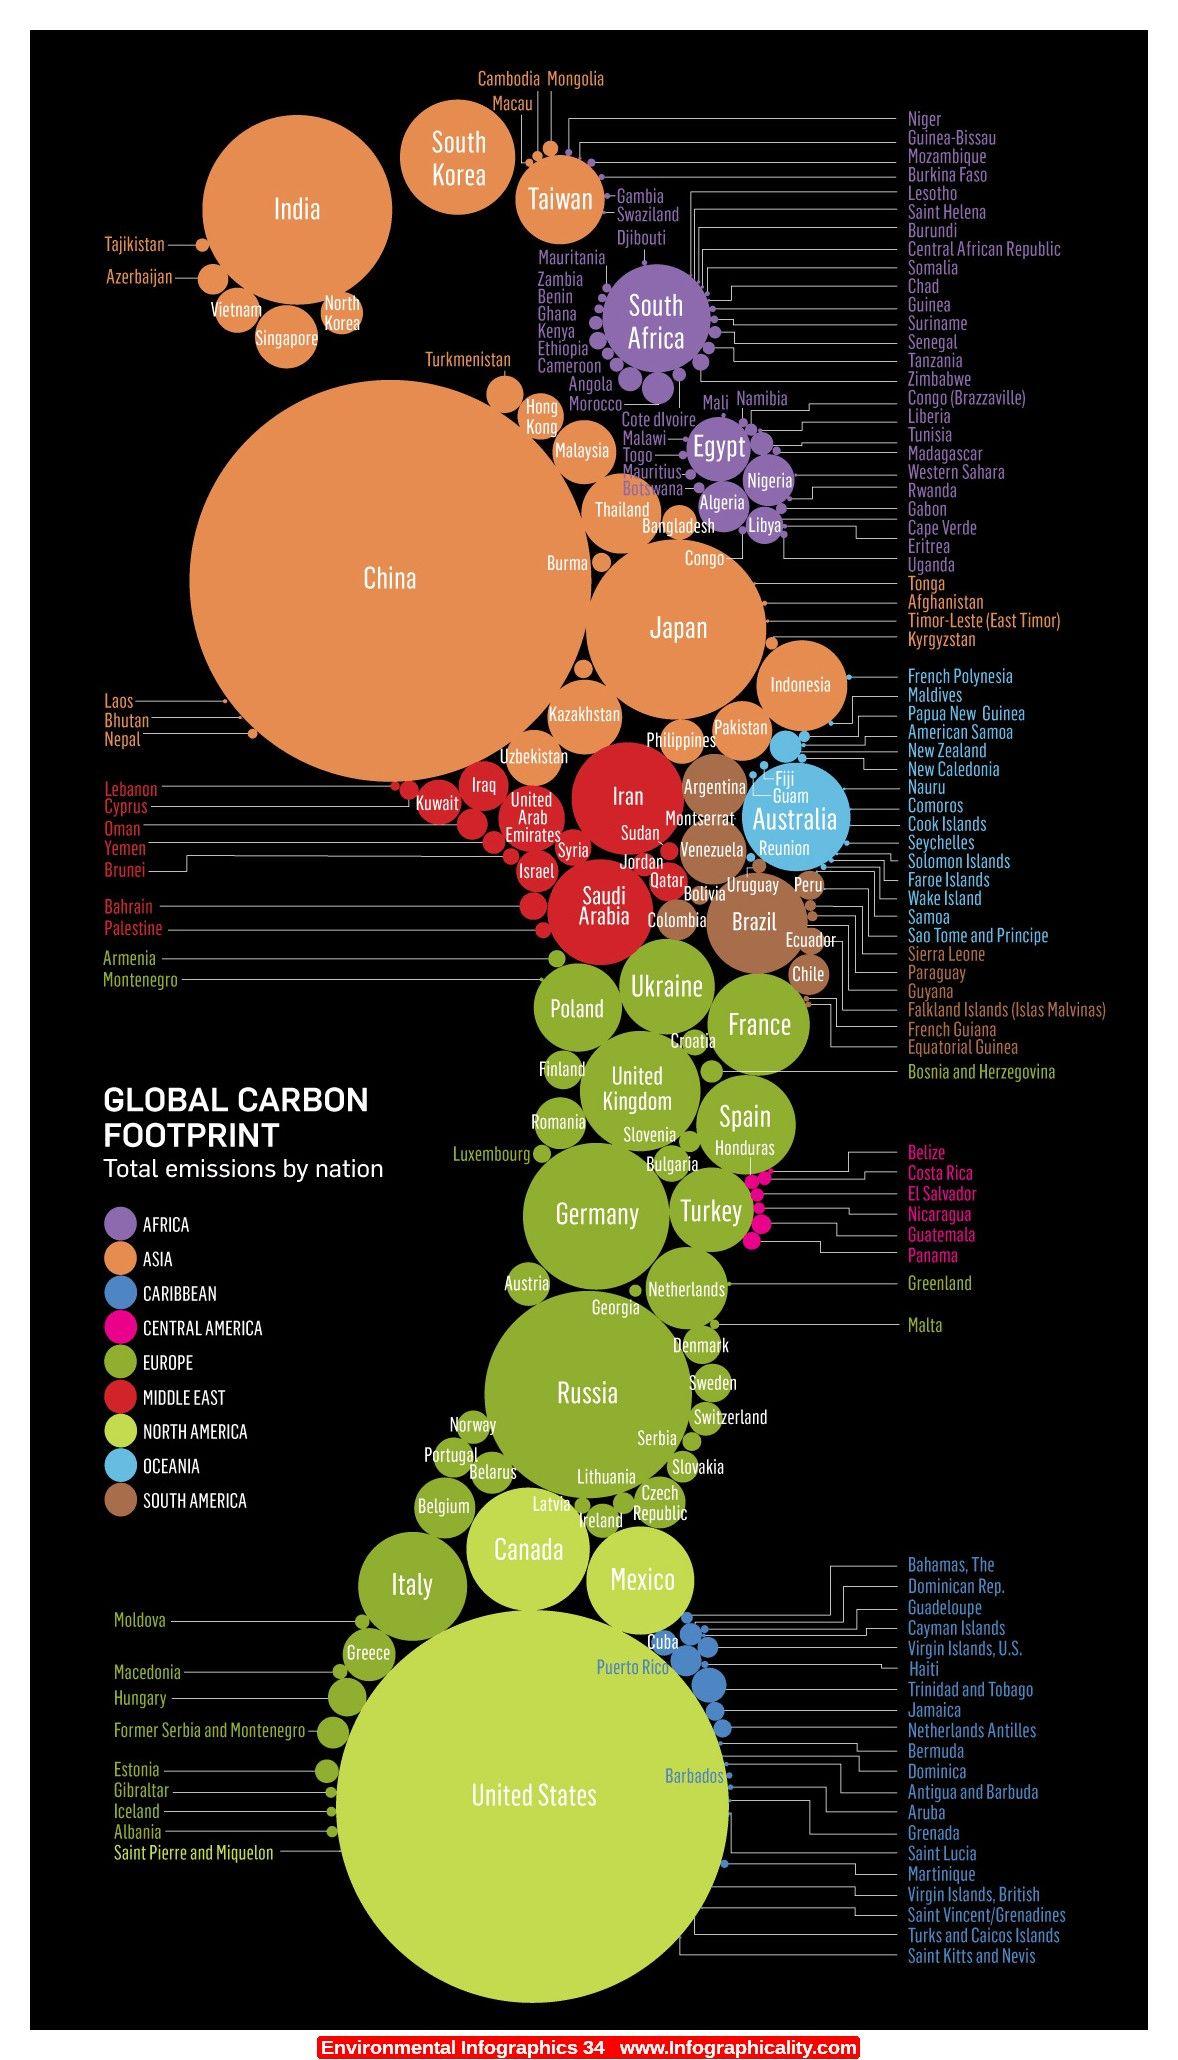 Environmental Infographics 34 - http://infographicality.com/environmental-infographics-34/